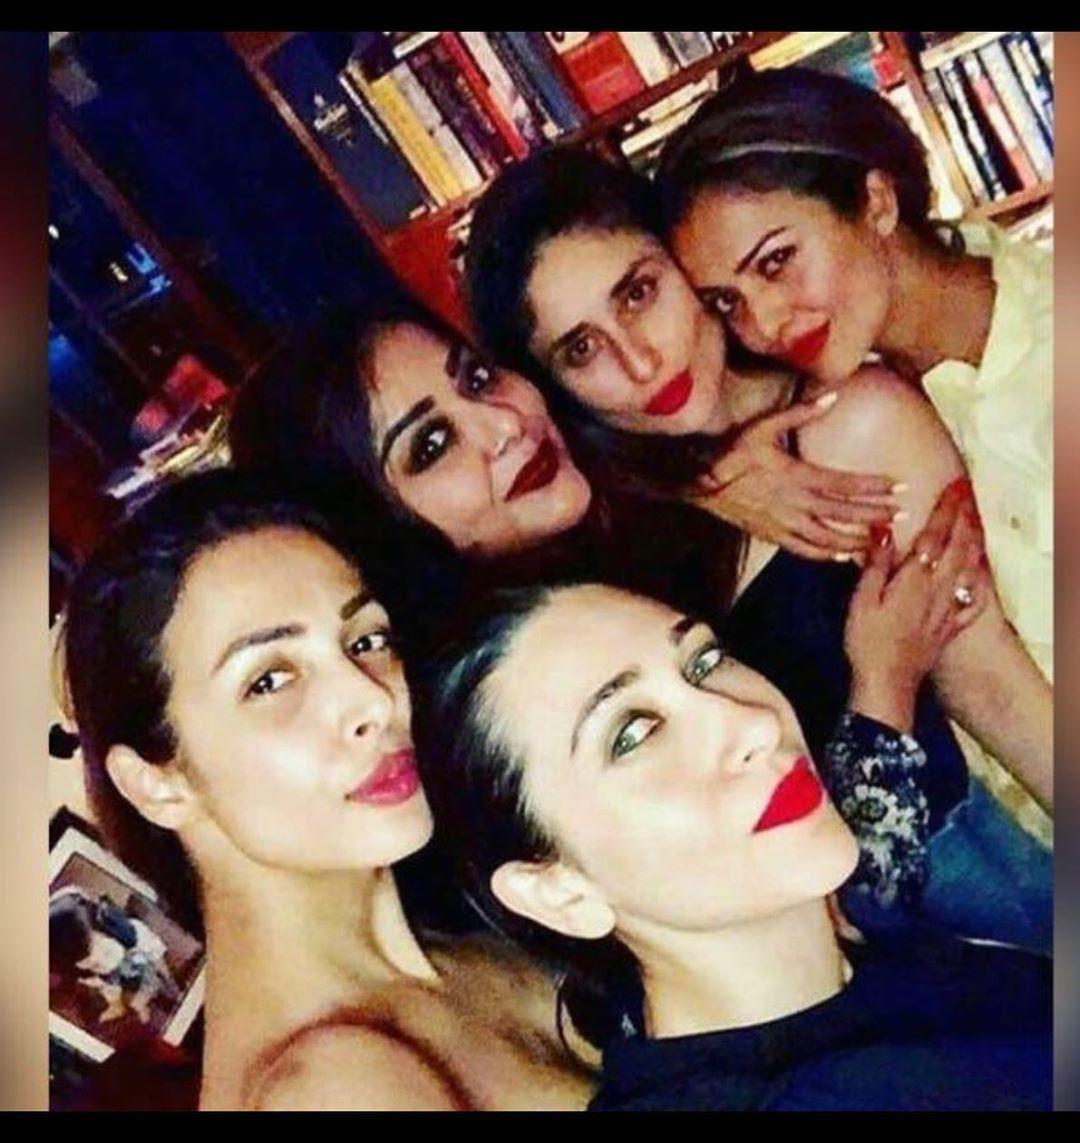 Malaika Arora, Kareena Kapoor Khan, Karisma Kapoor, Amrita Arora